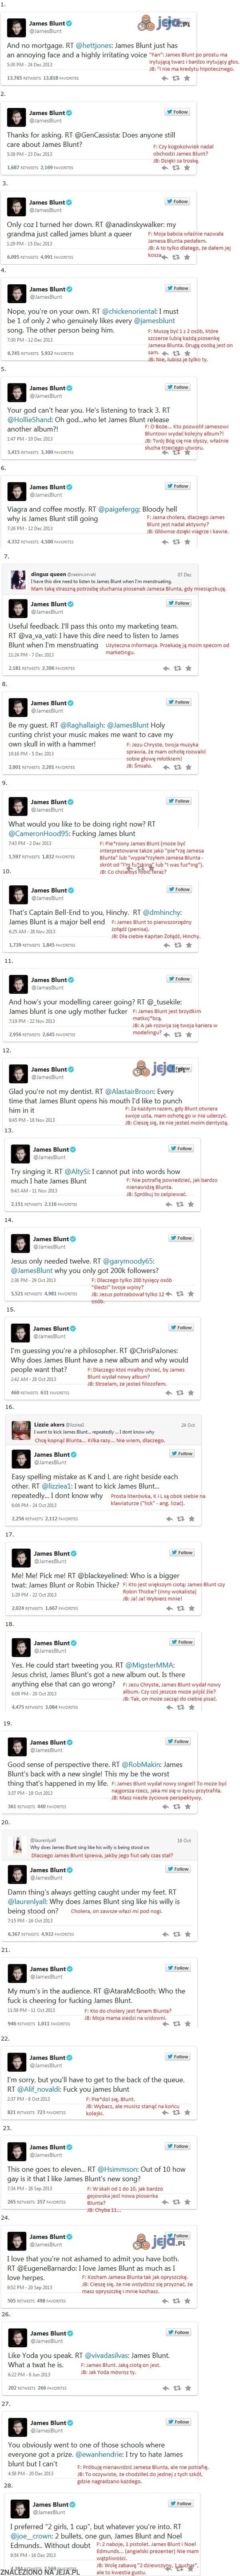 James Blunt i jego cięte riposty na Twitterze